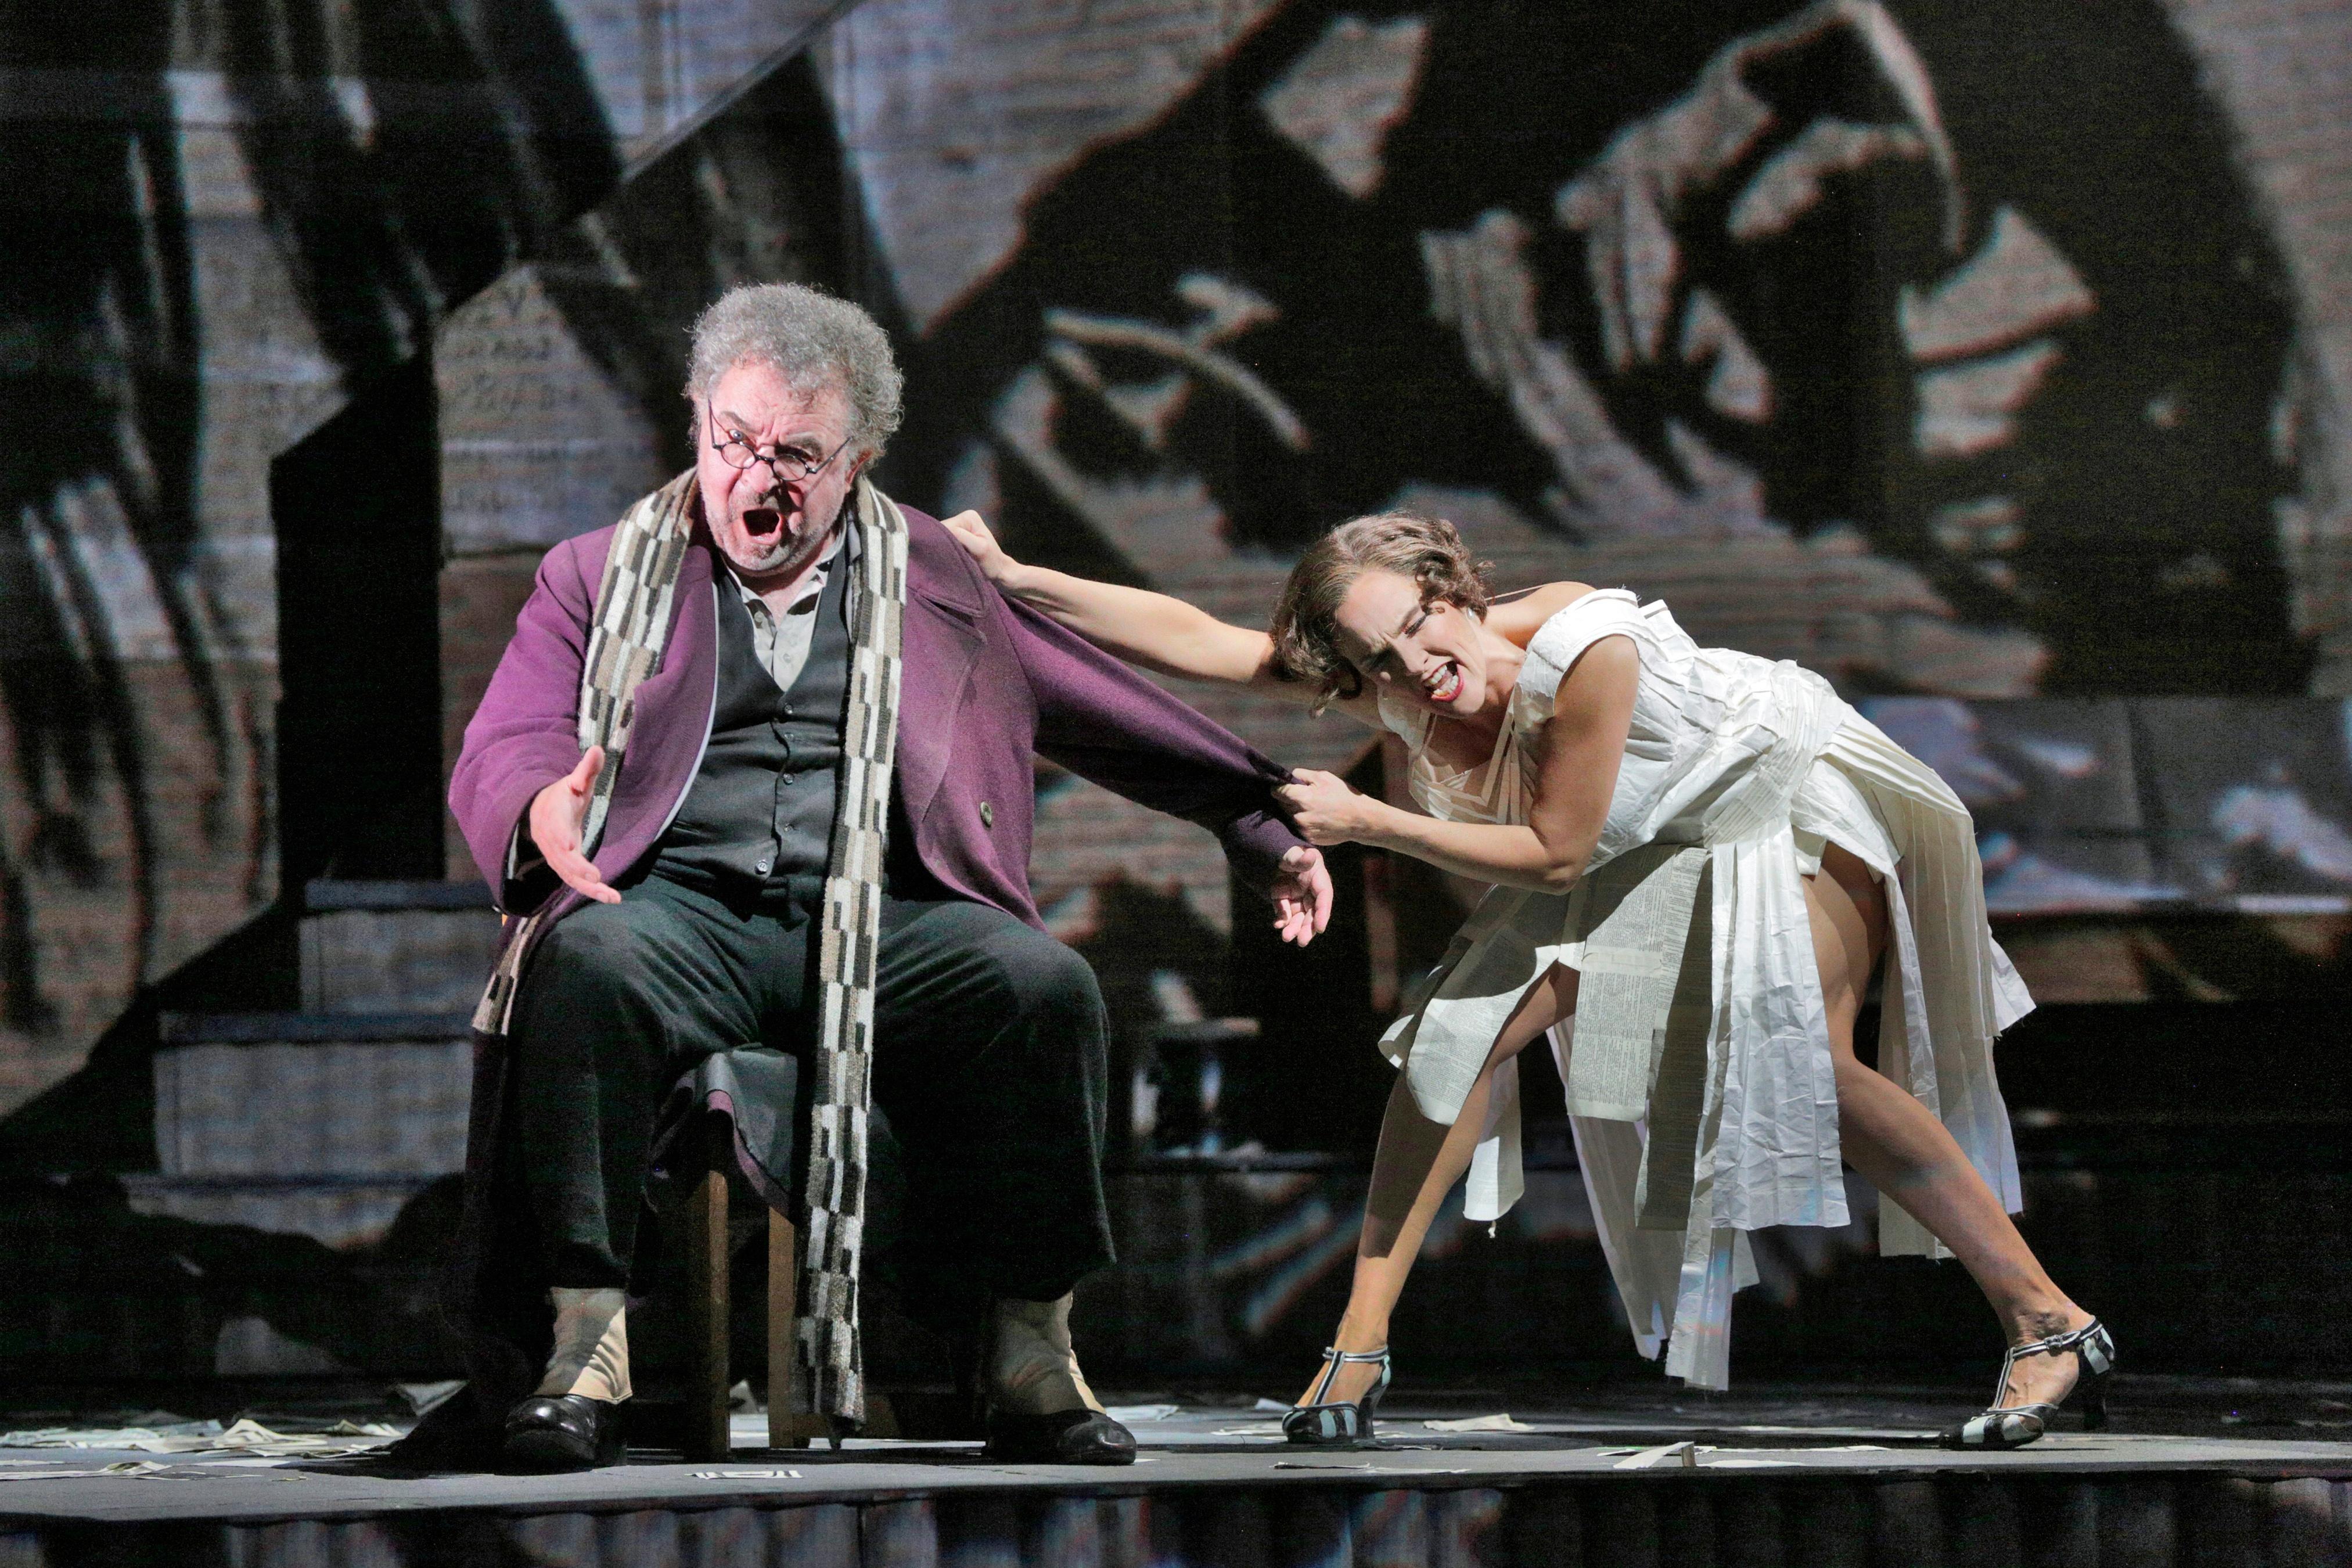 The Lulu Metropolitan Opera Talk at The Museum of Modern